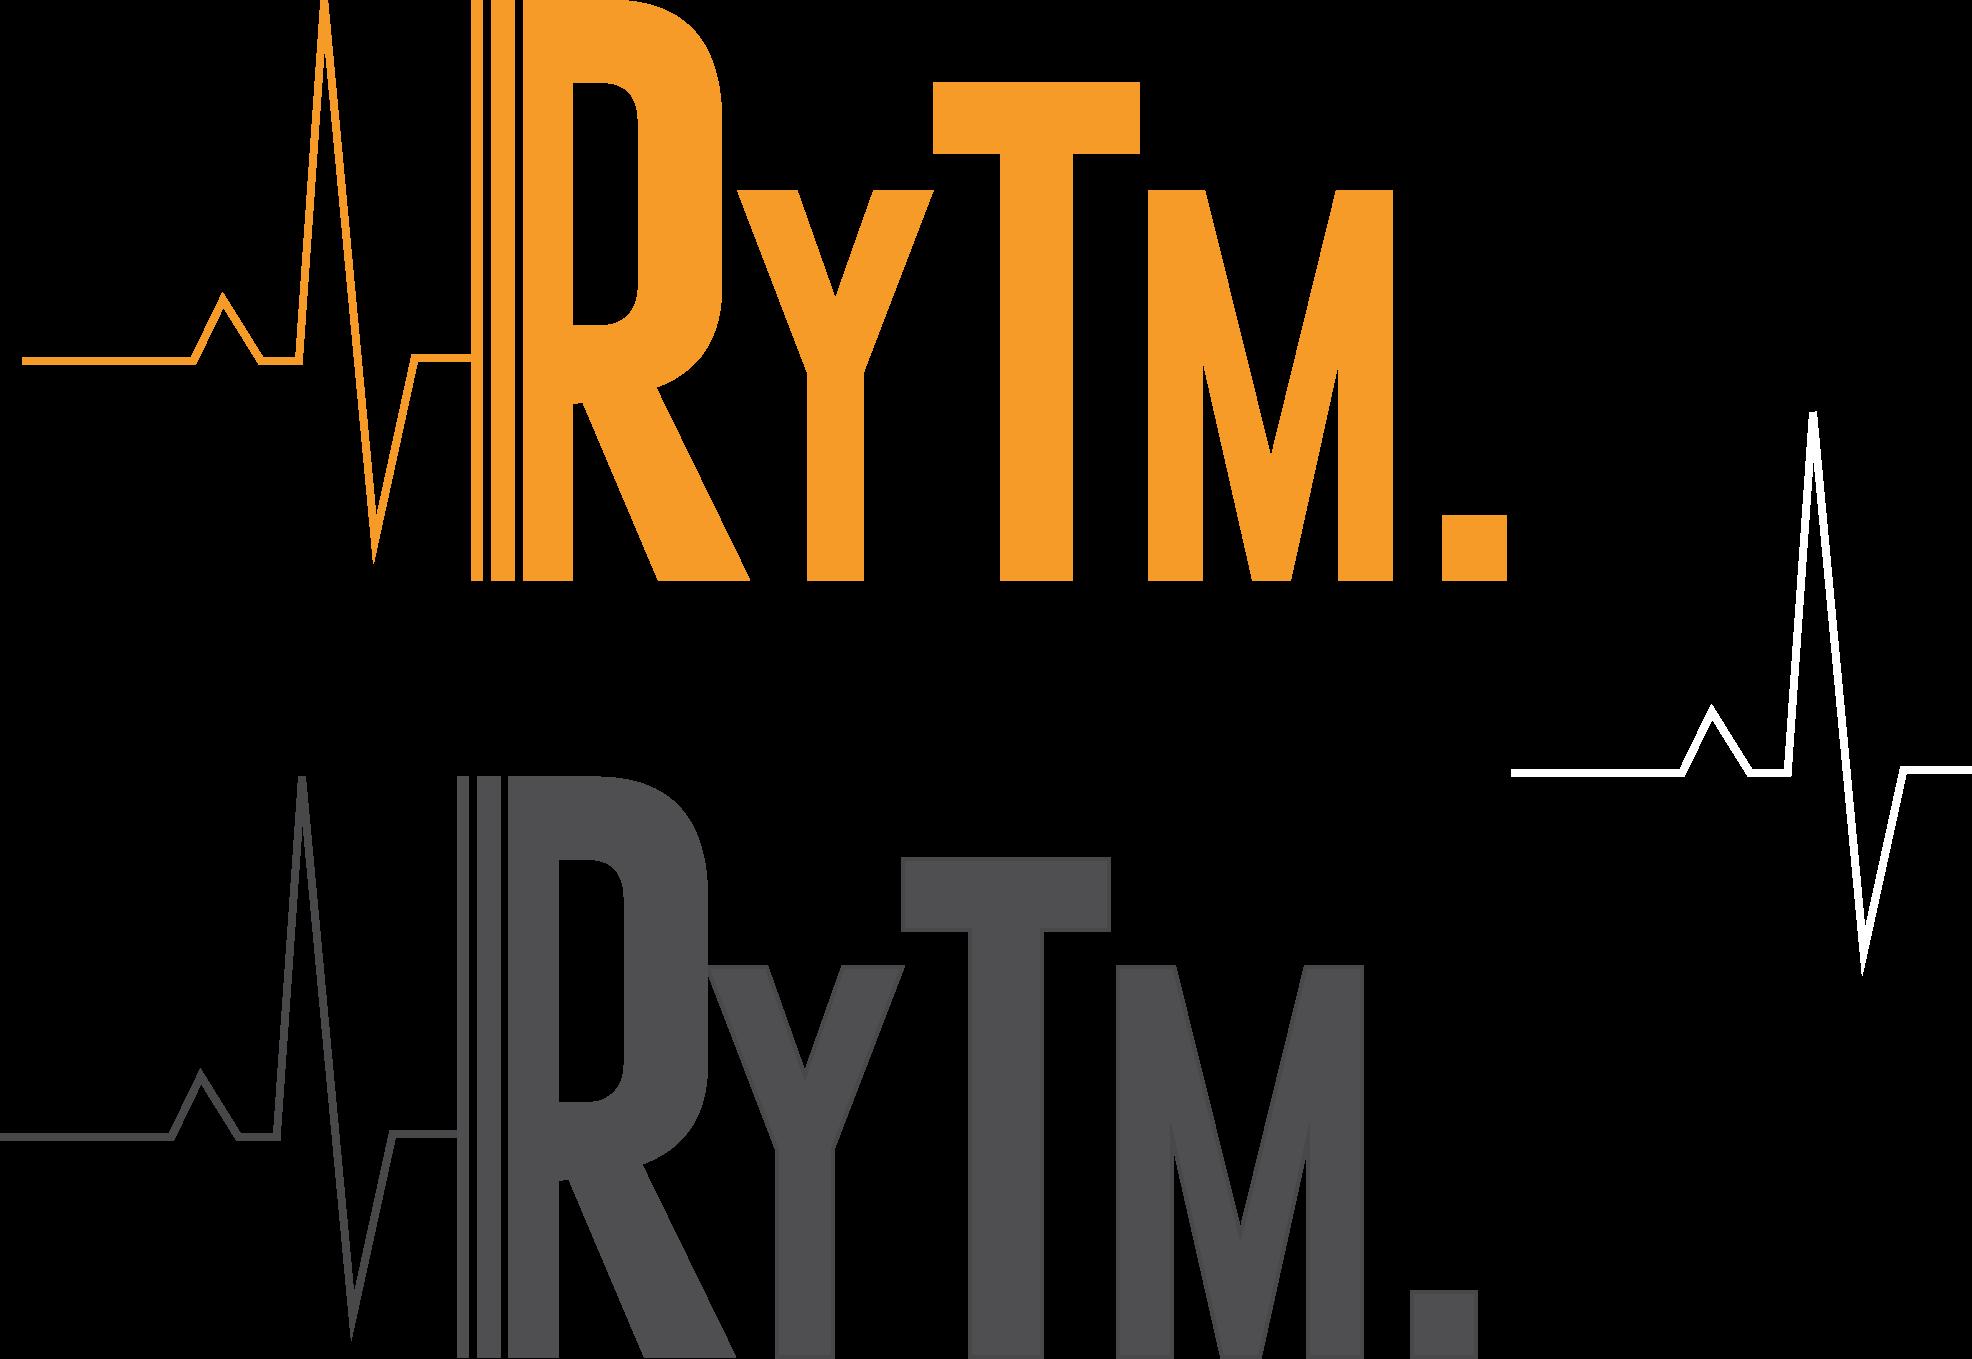 Logo Rytm avec ses déclinaisons